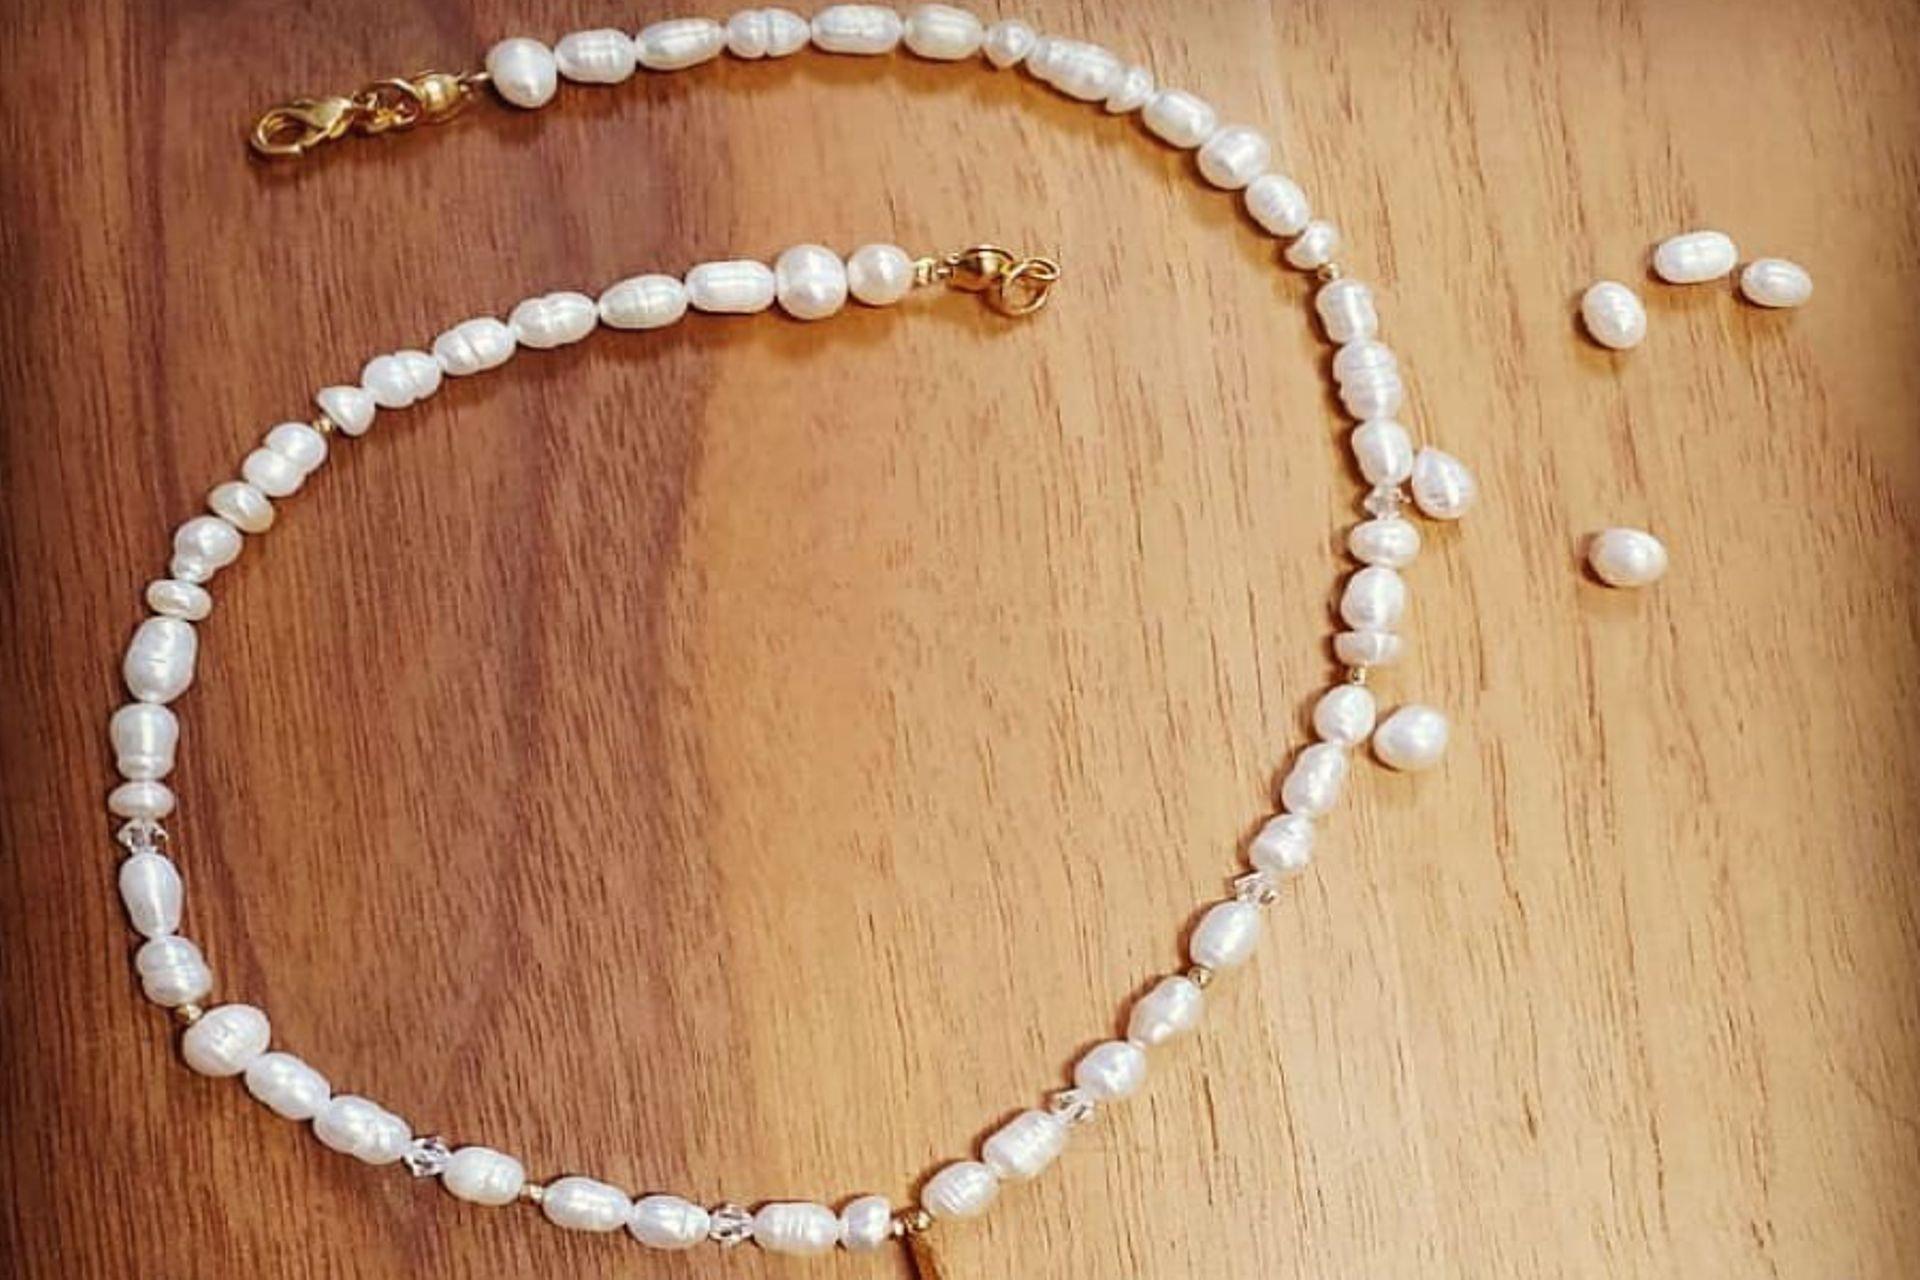 28 lantana beads jewelry designer תְמוּנָה